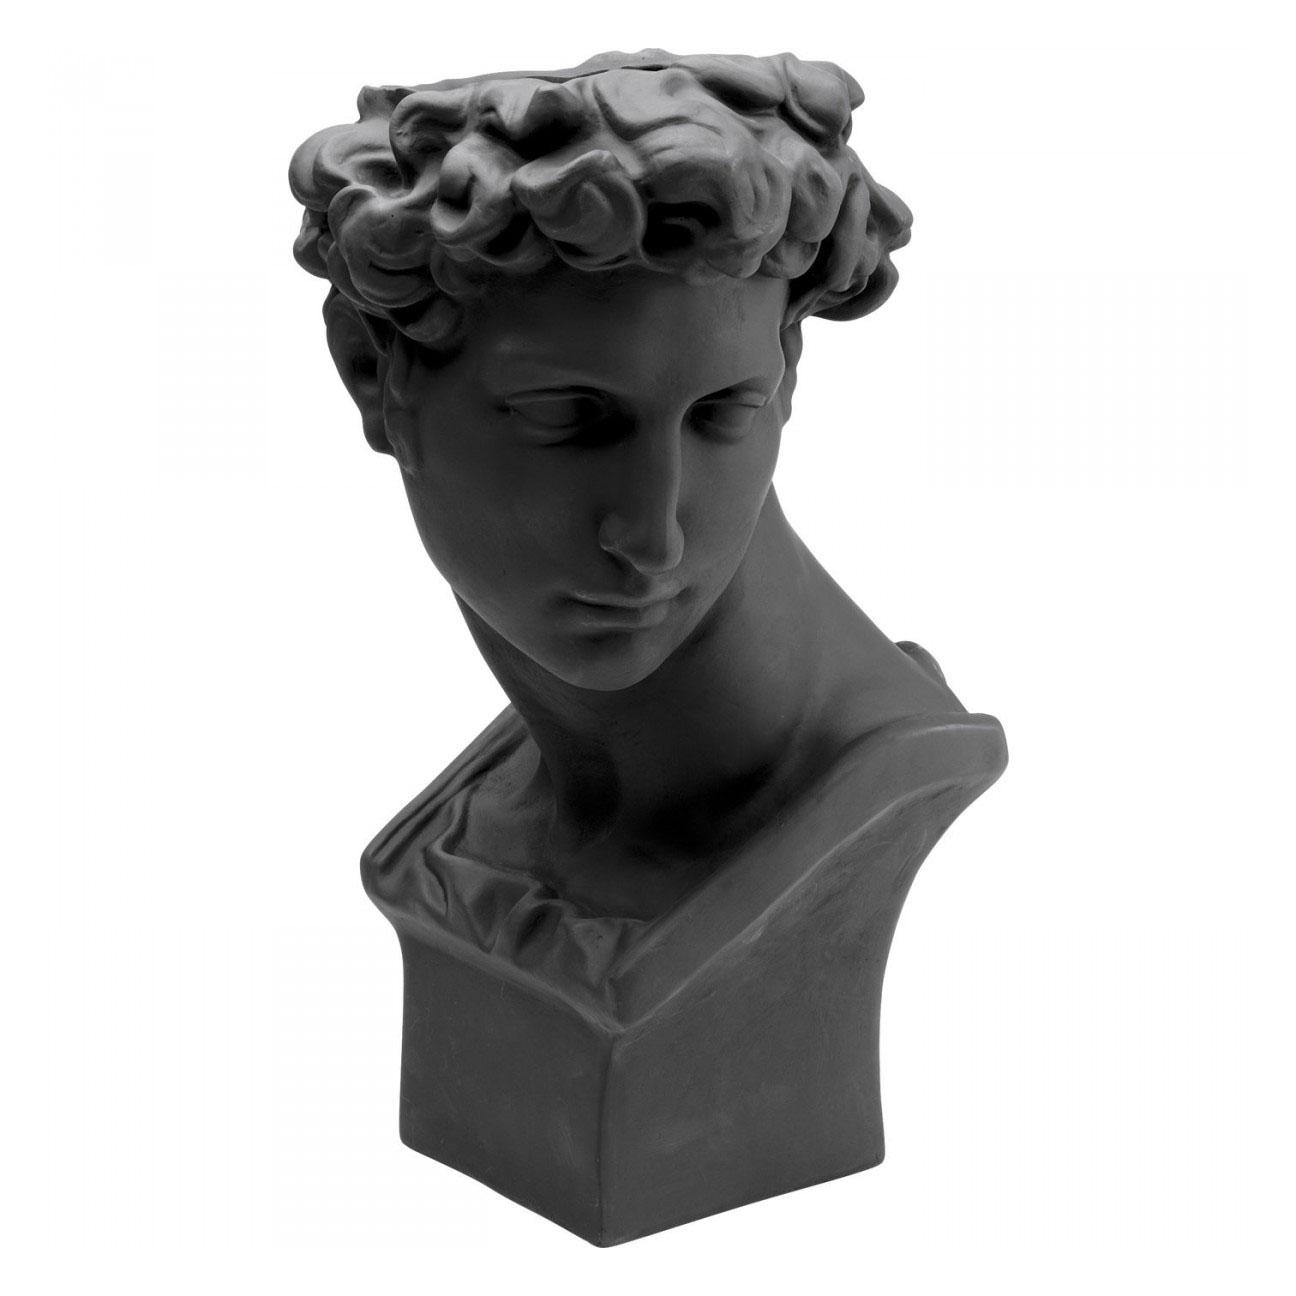 KARE DESIGN David Black dekorationsurtepotte - sort fiberglas